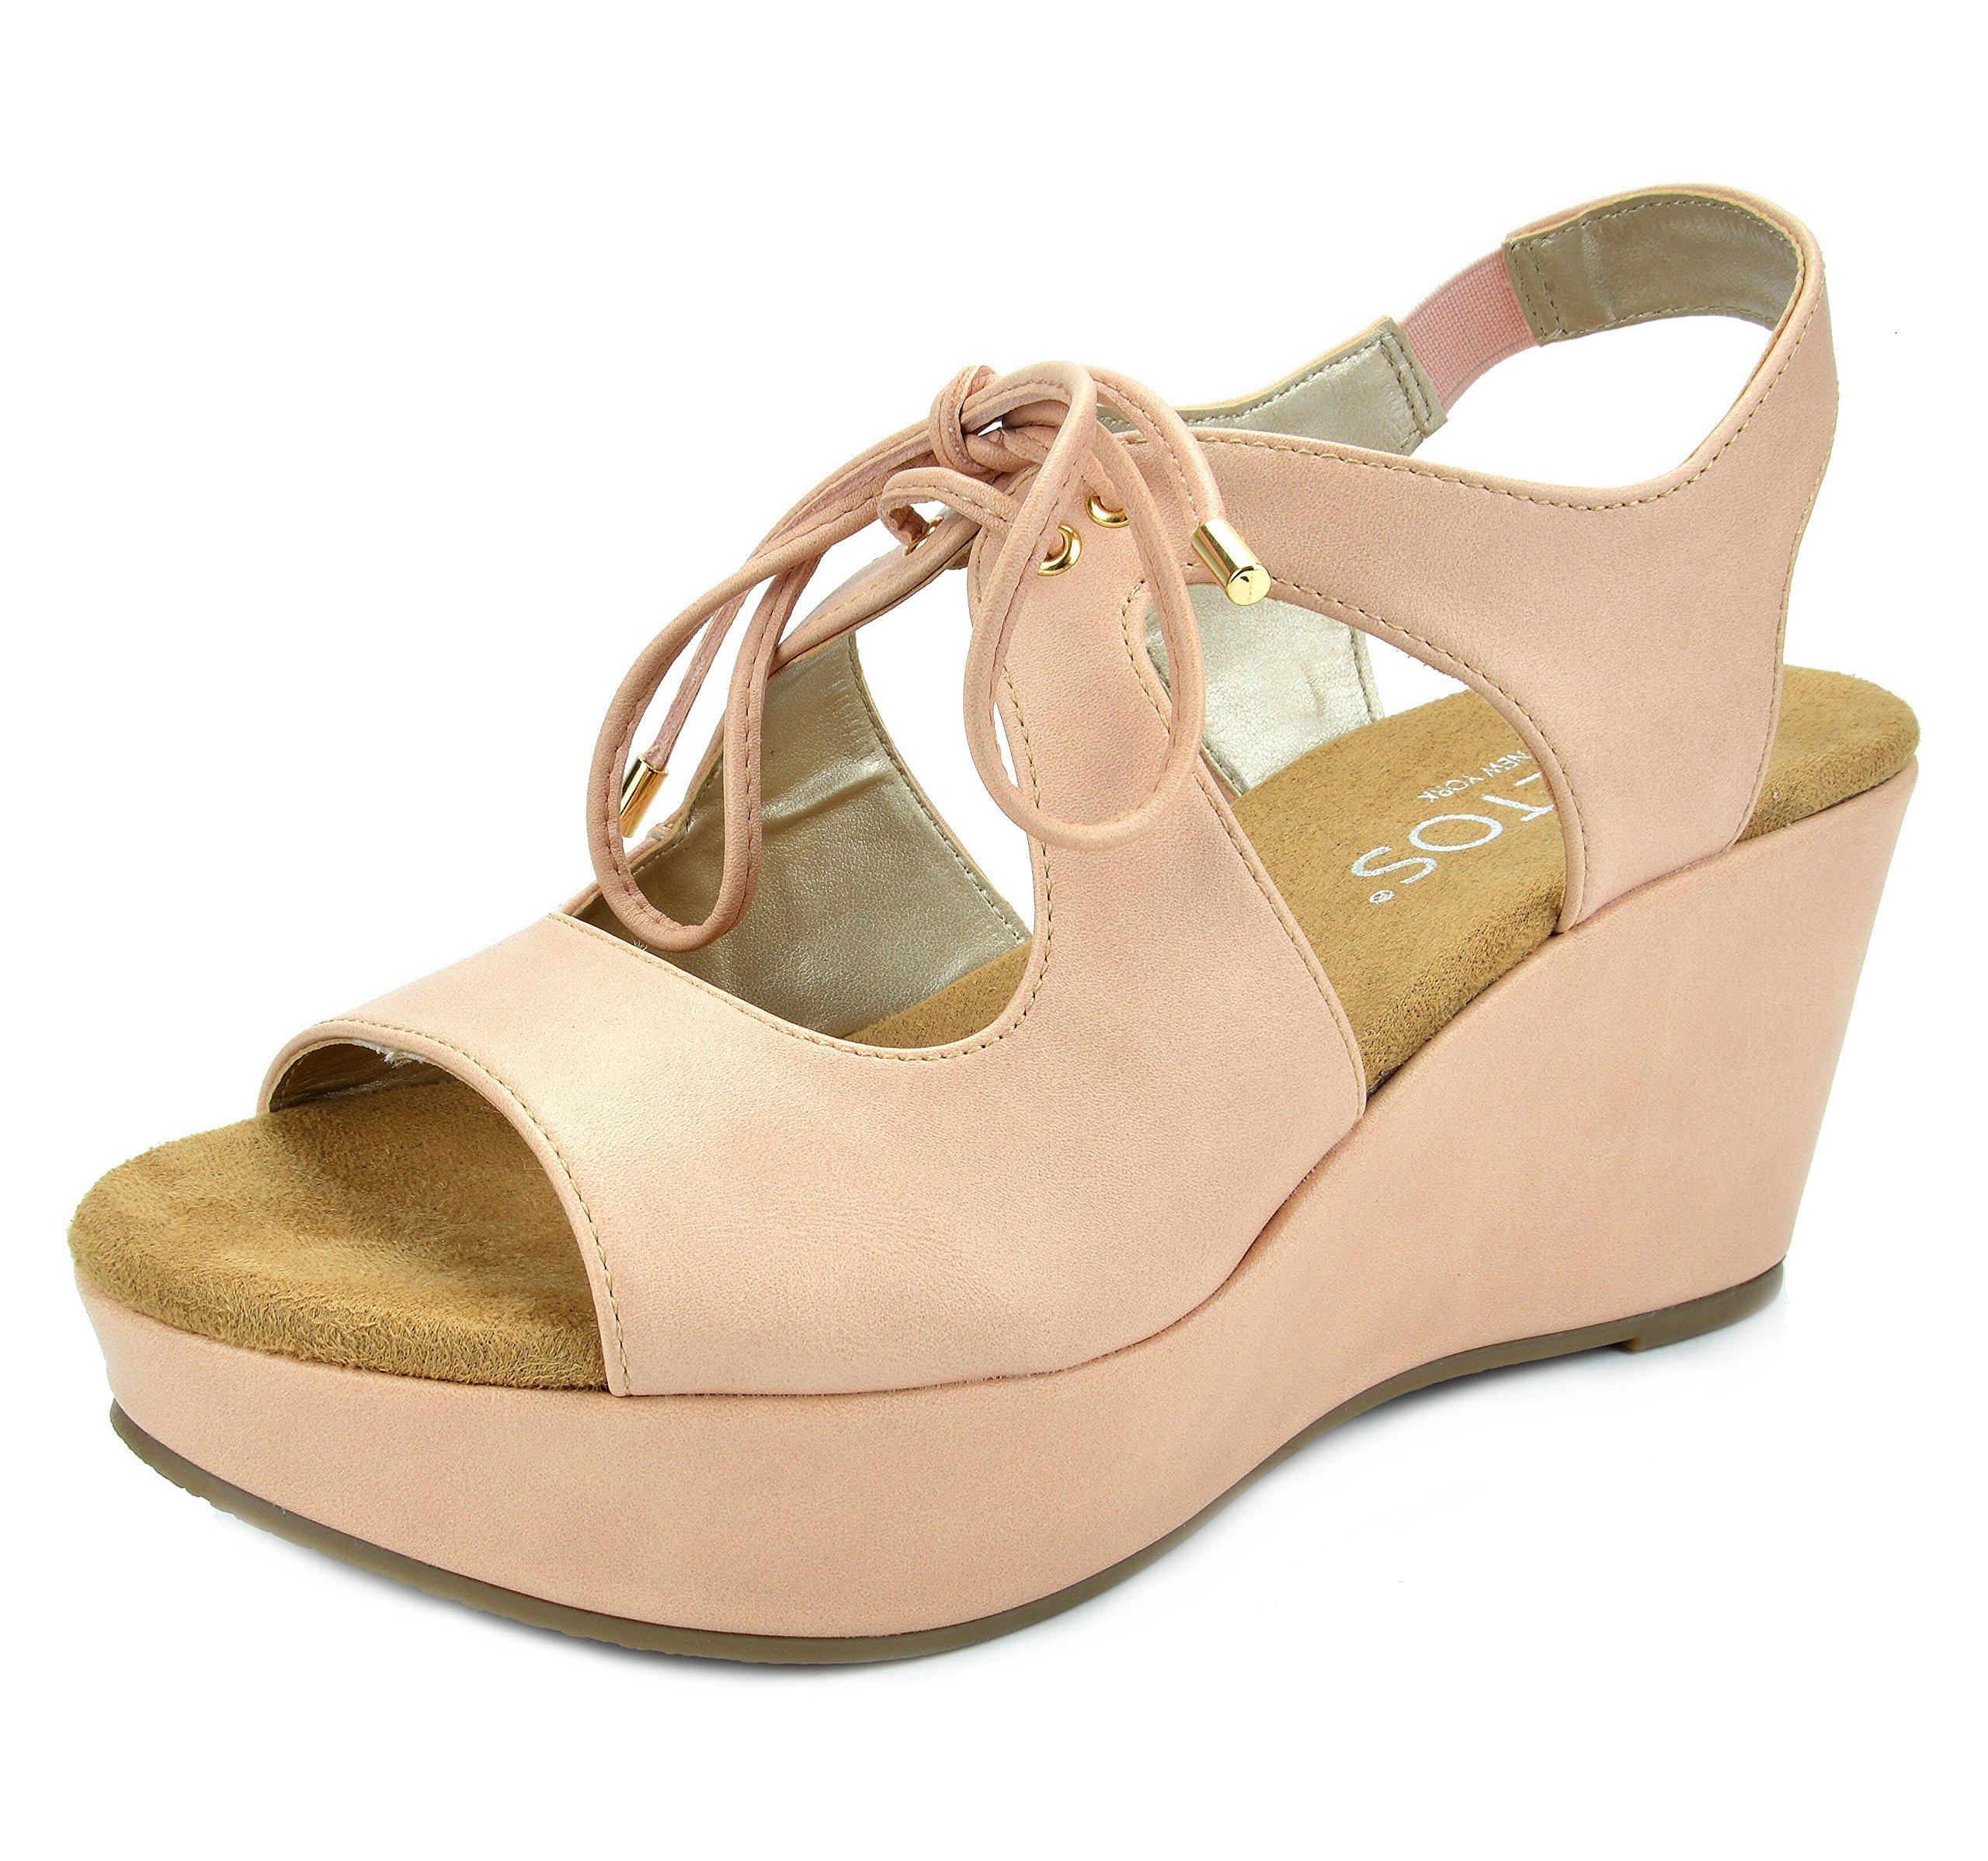 1e0ccf83a TOETOS Women's Sandro-02 Pink Dust Mid Heel Platform Wedges Sandals - 8.5 M  US